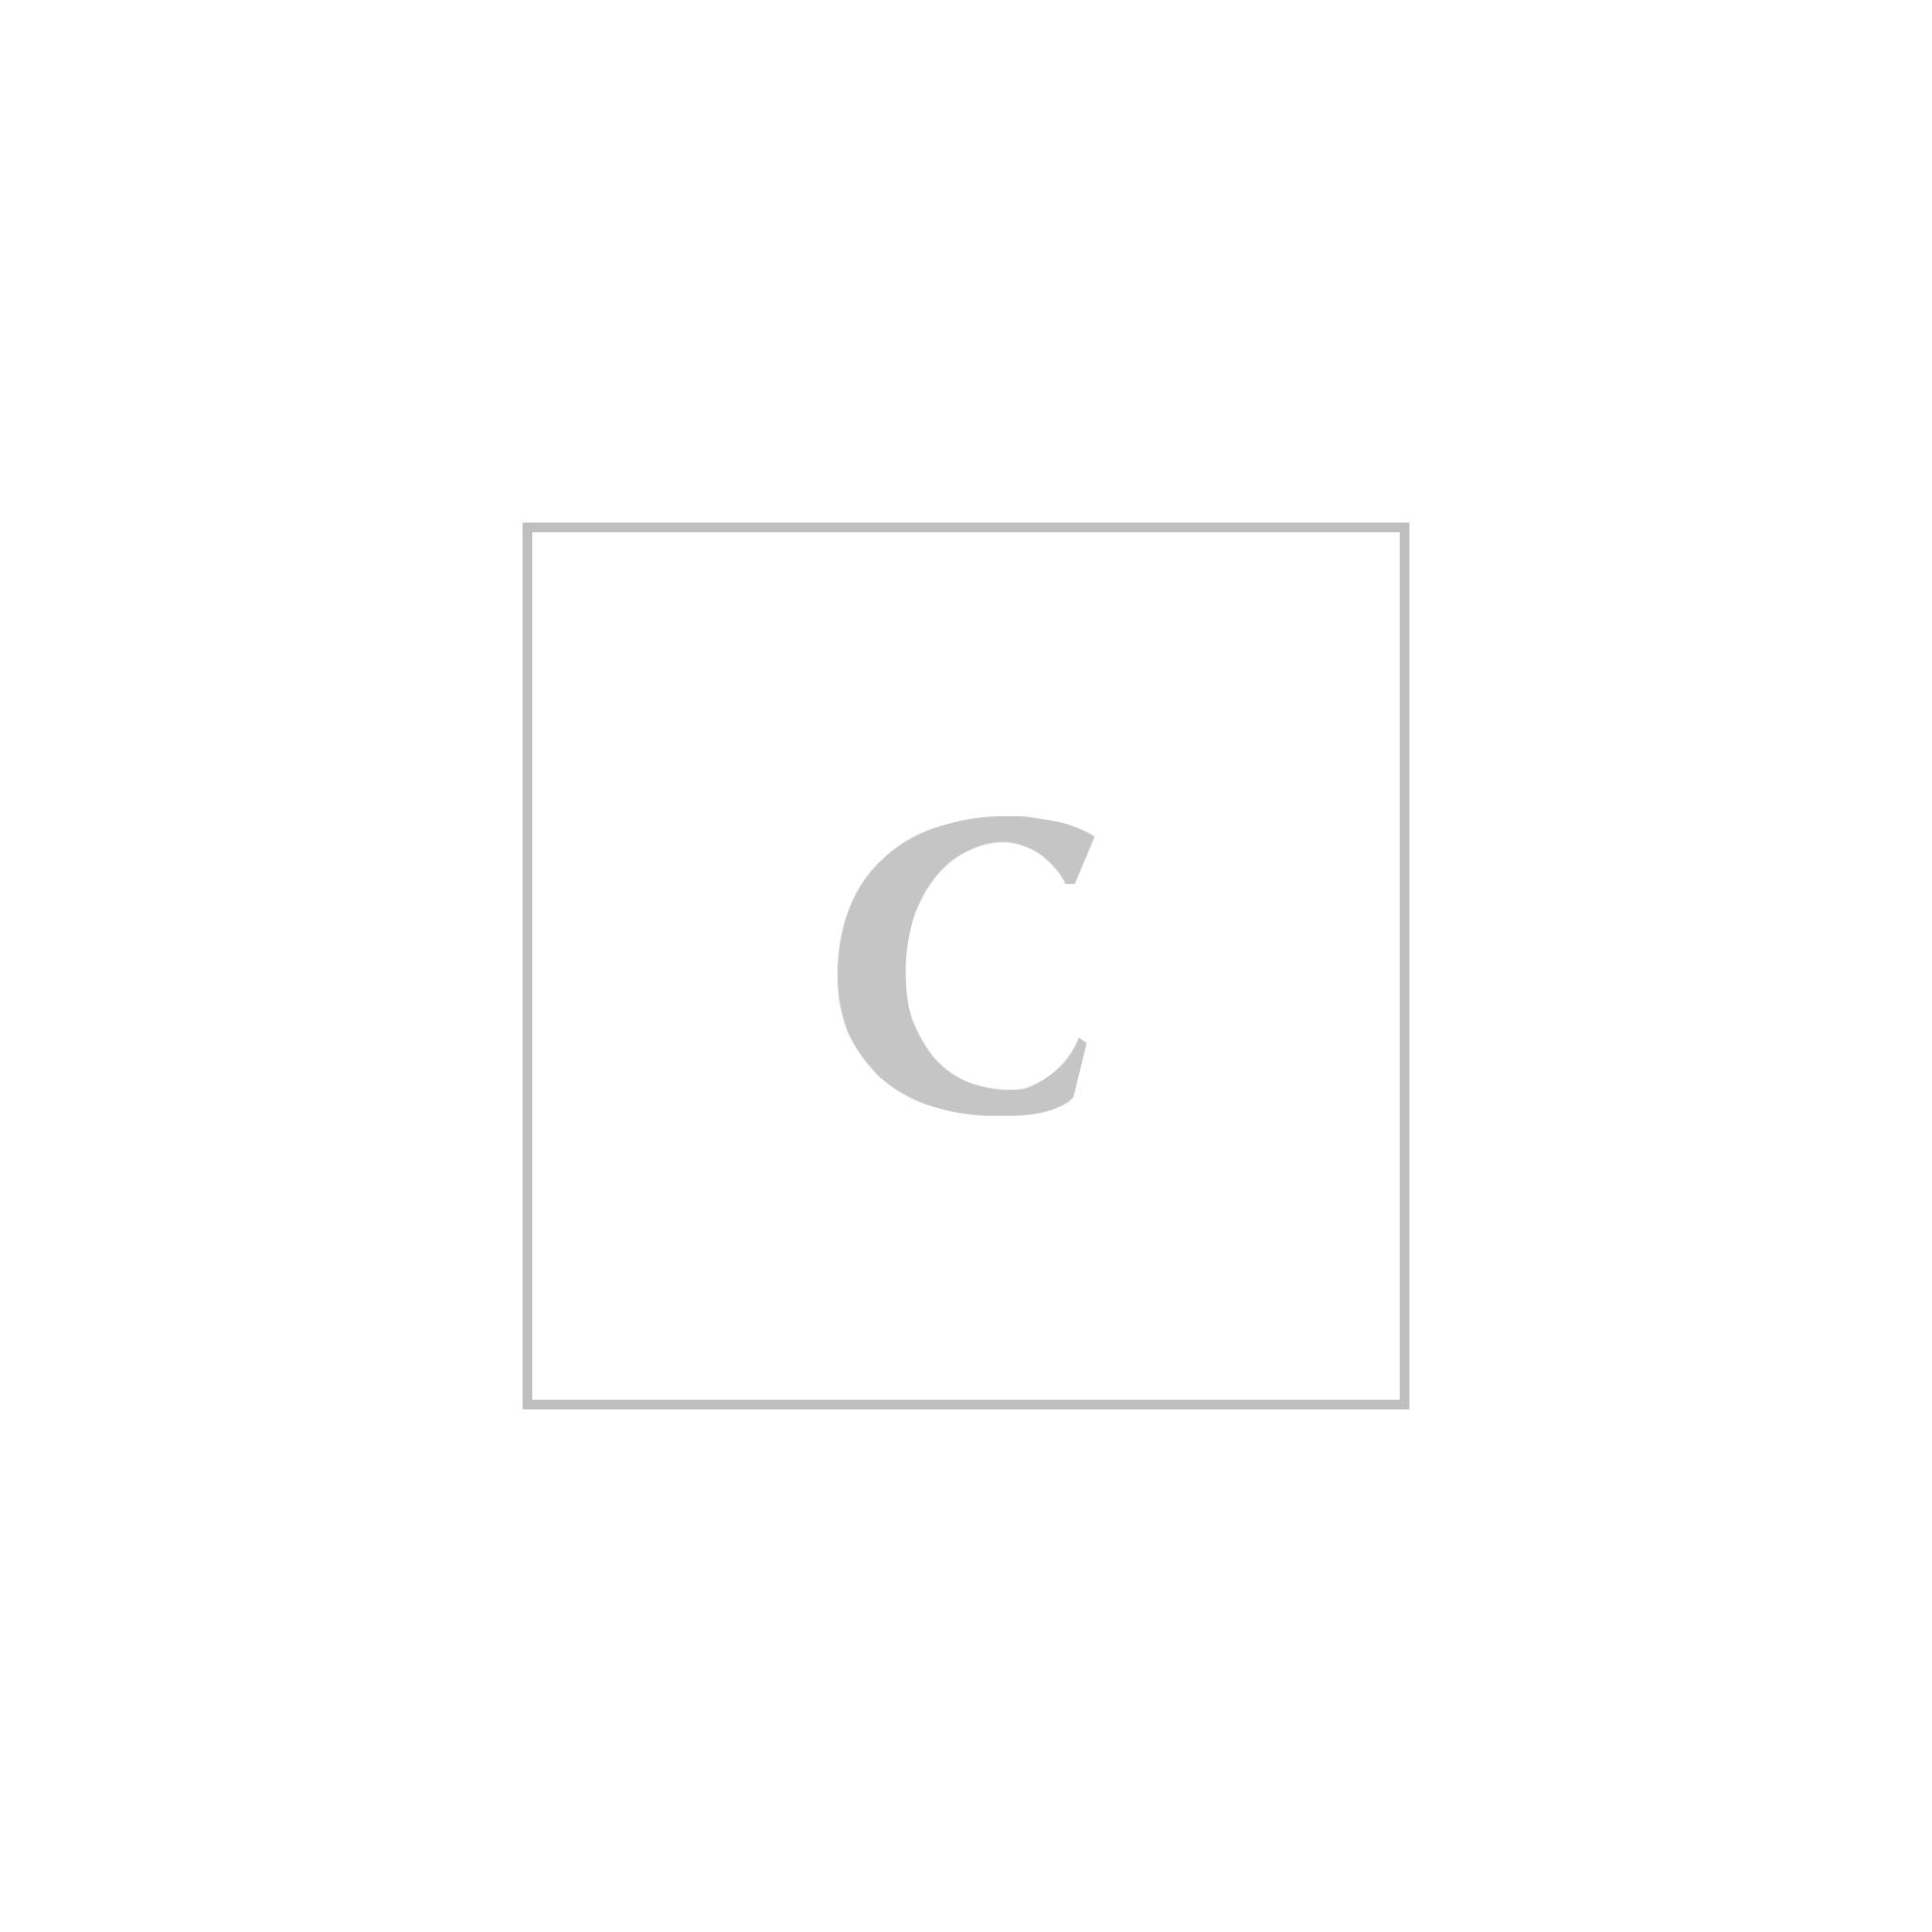 Burberry giaccone